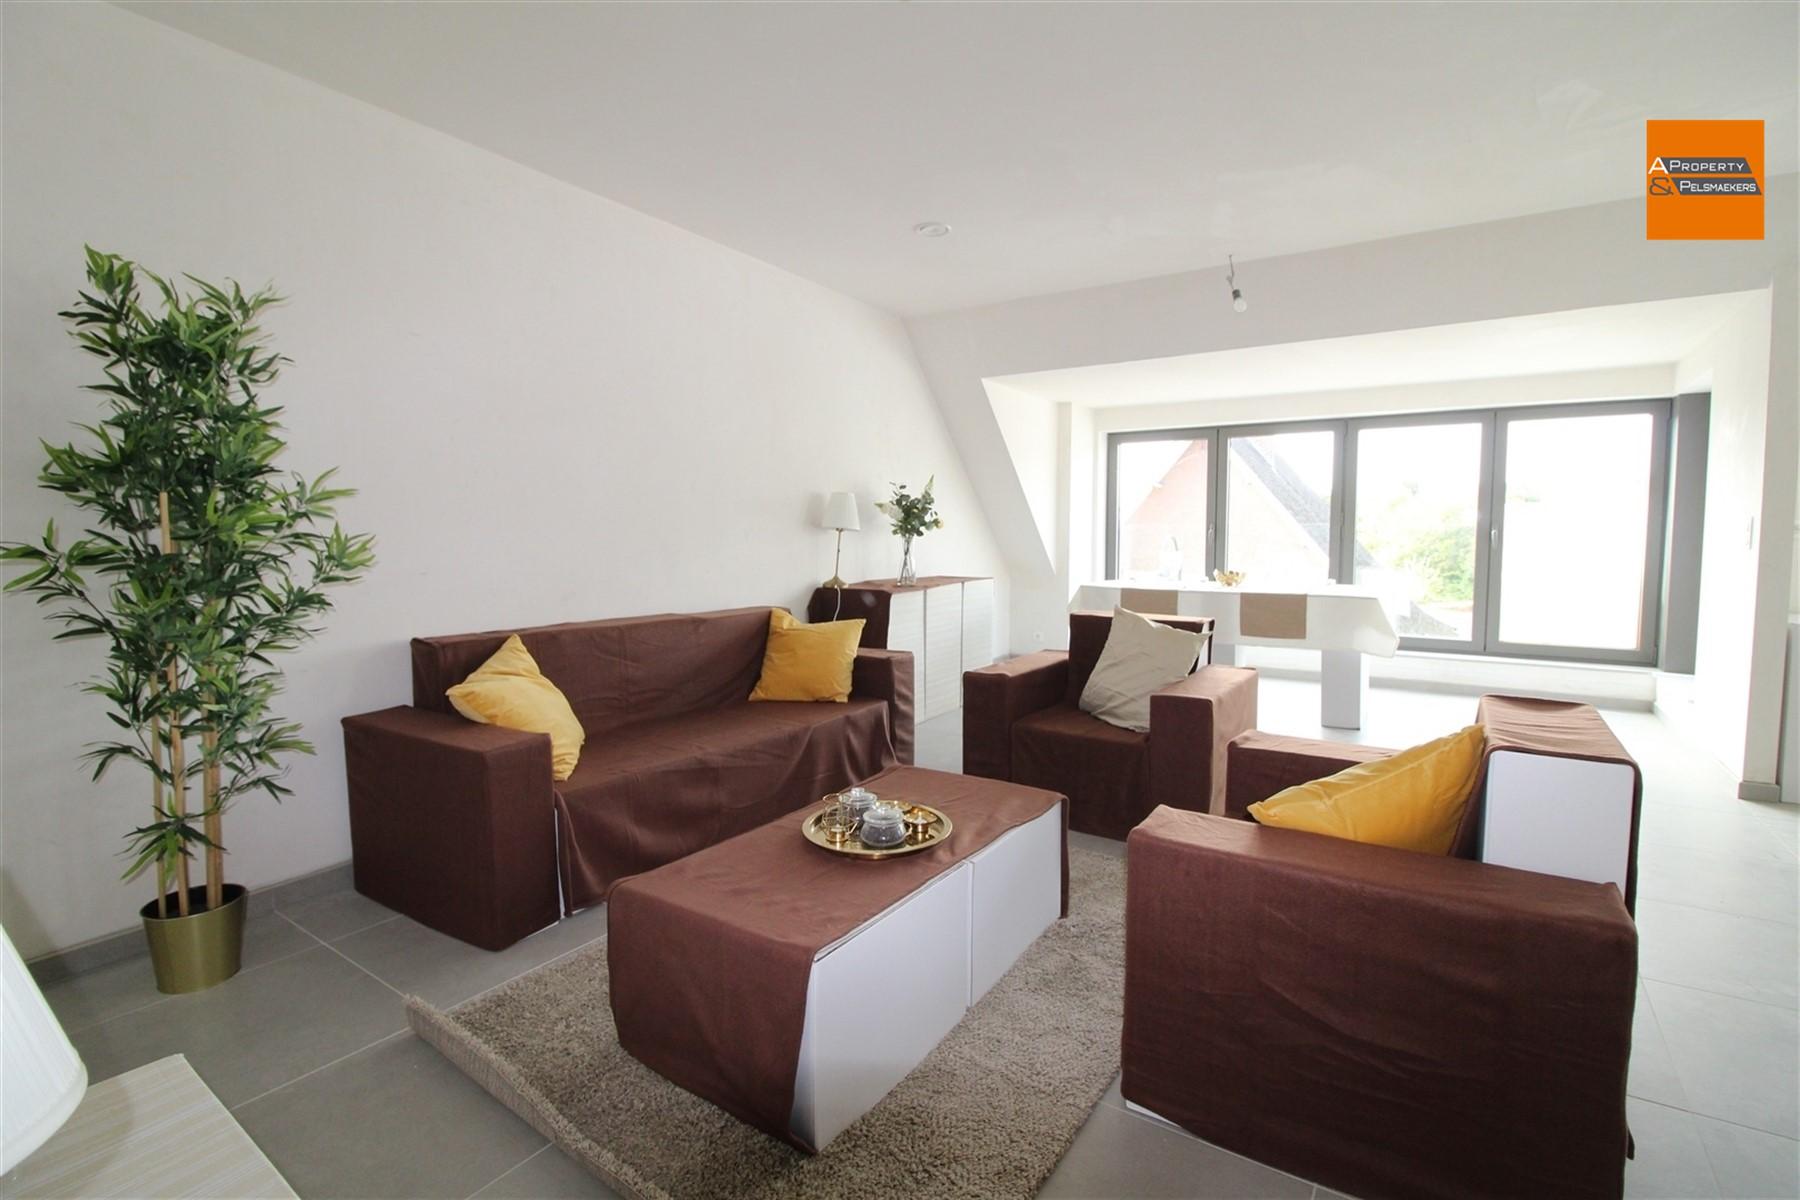 Foto 1 : Appartement in 3060 BERTEM (België) - Prijs € 319.000